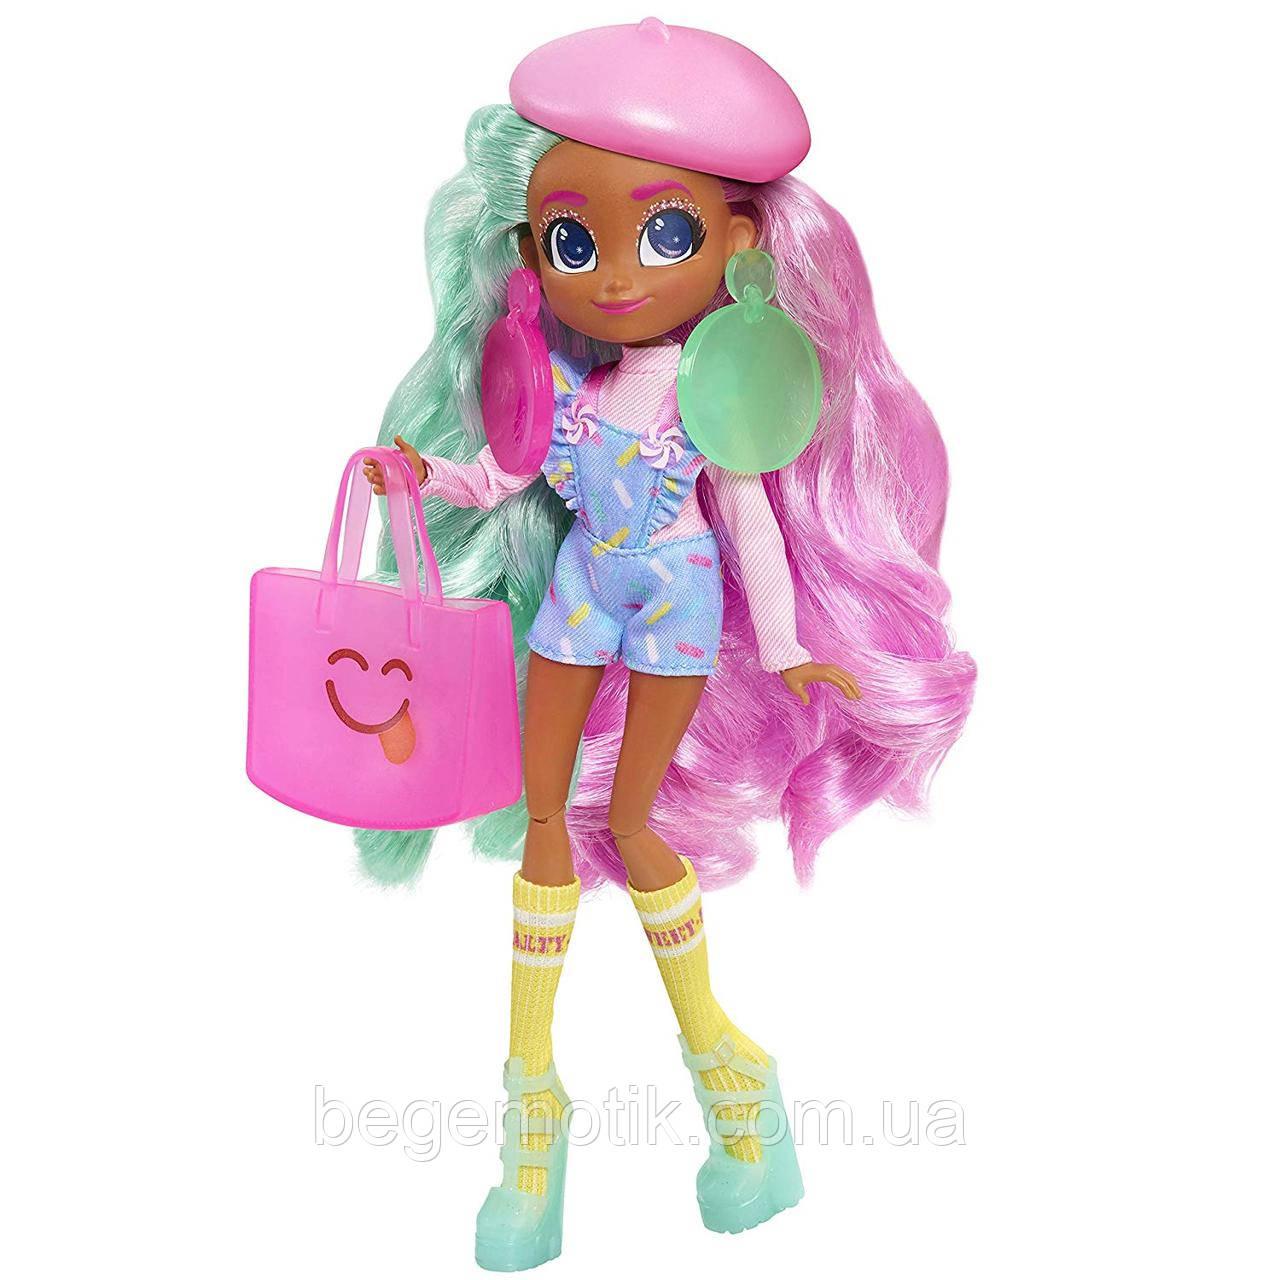 Большая Кукла Хэрдораблс Ди Ди Старшая сестра Hairdorables Hairmazing Dee Dee Fashion Doll